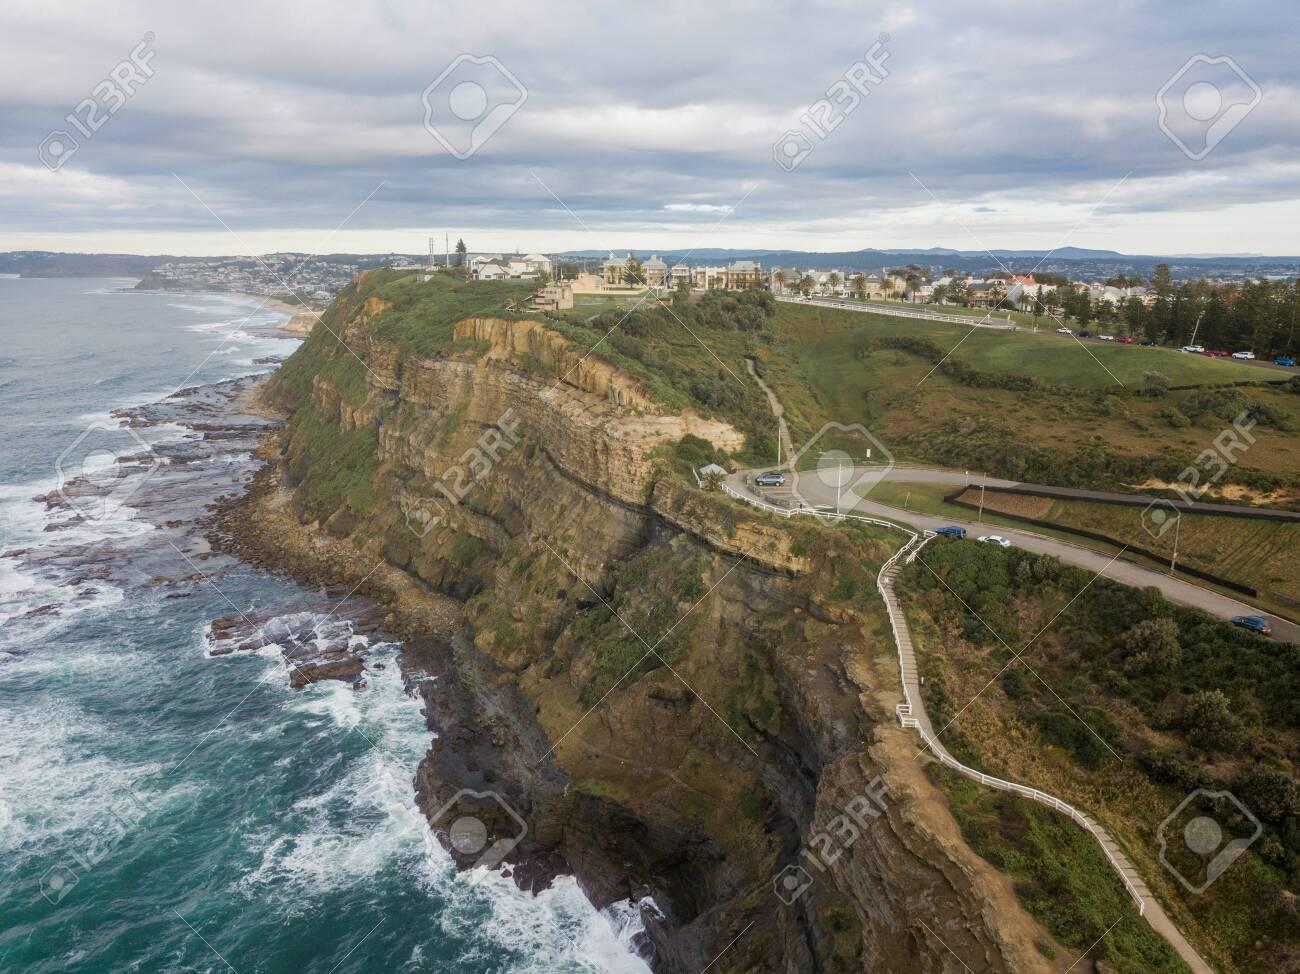 Aerial view of Newcastle coastline, Australia. - 153110645